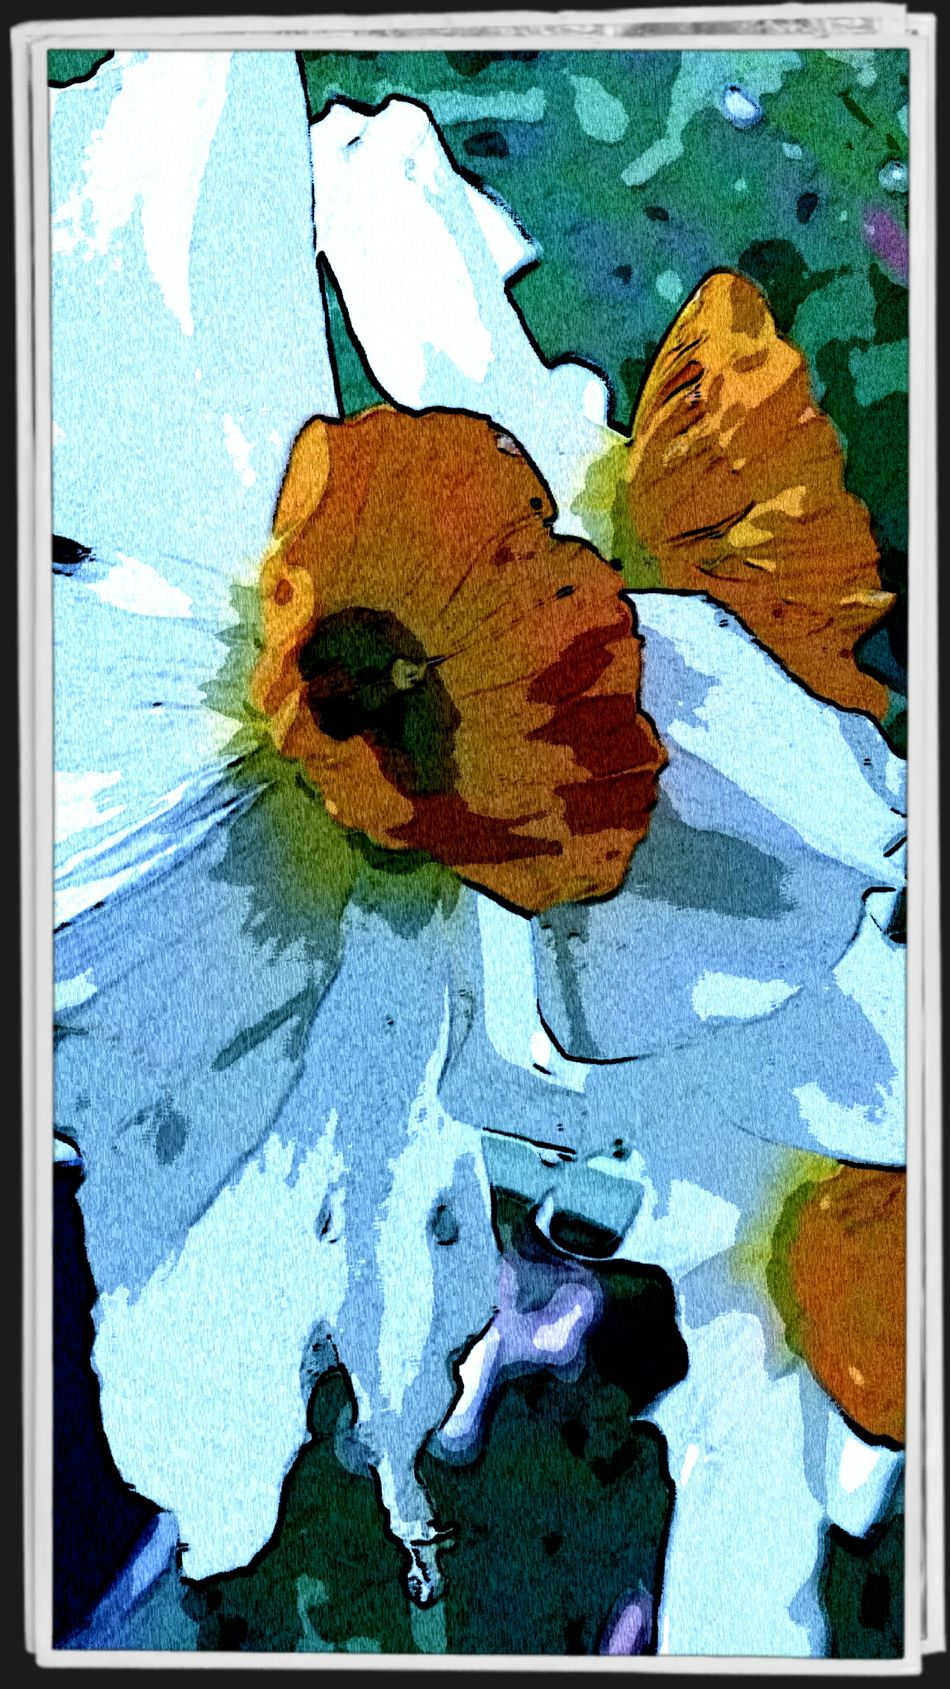 seen on my morning walk in Münster Taking Photos Instagram #followme #follow #eyeem #awesome #streamzoo #instahub #photo #sigueme #followhim #cute #follow4follow F4f Followback [ Flower Art Heartflowers flower art eye flowerforyou floweholic streamzooville flowerstream